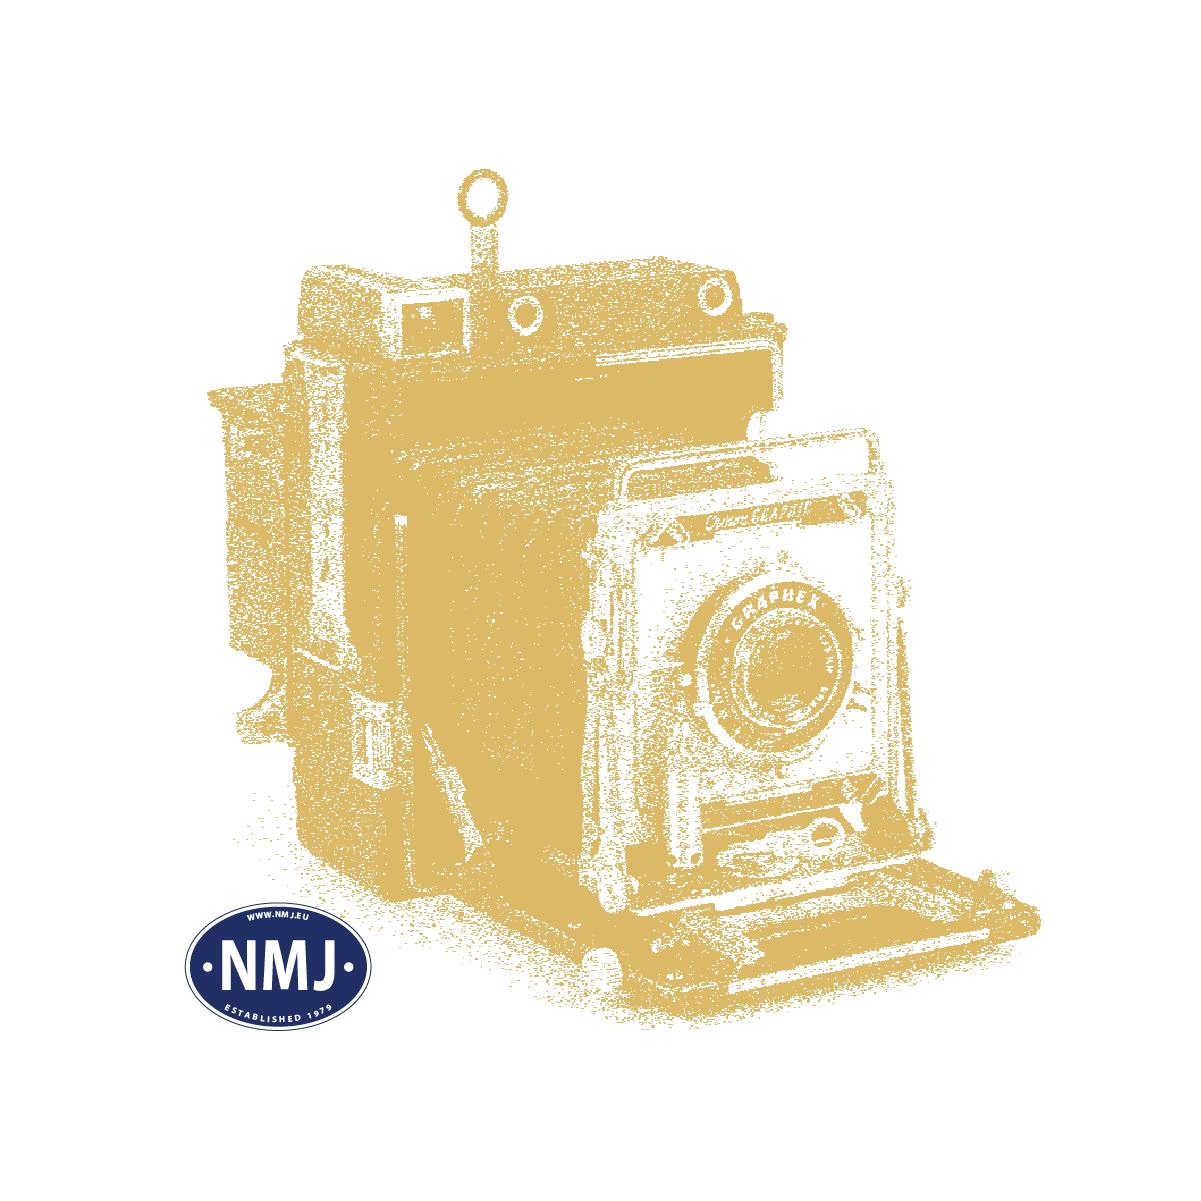 NMJT245001 - NMJ Topline NSB DI3.602 Grønn, 0-Skala, DCC m/ Lyd